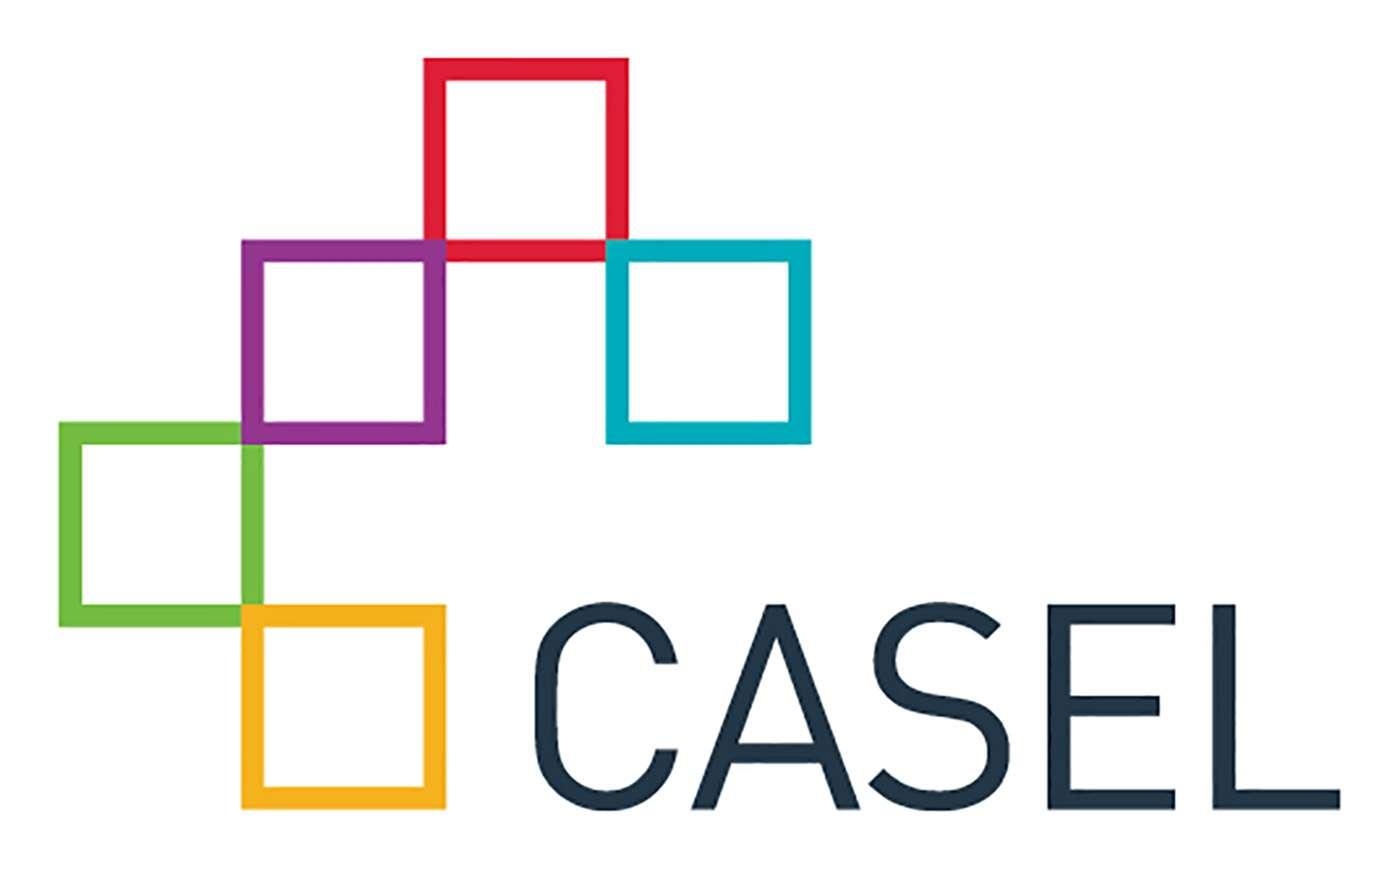 Logo design for CASEL visual identity